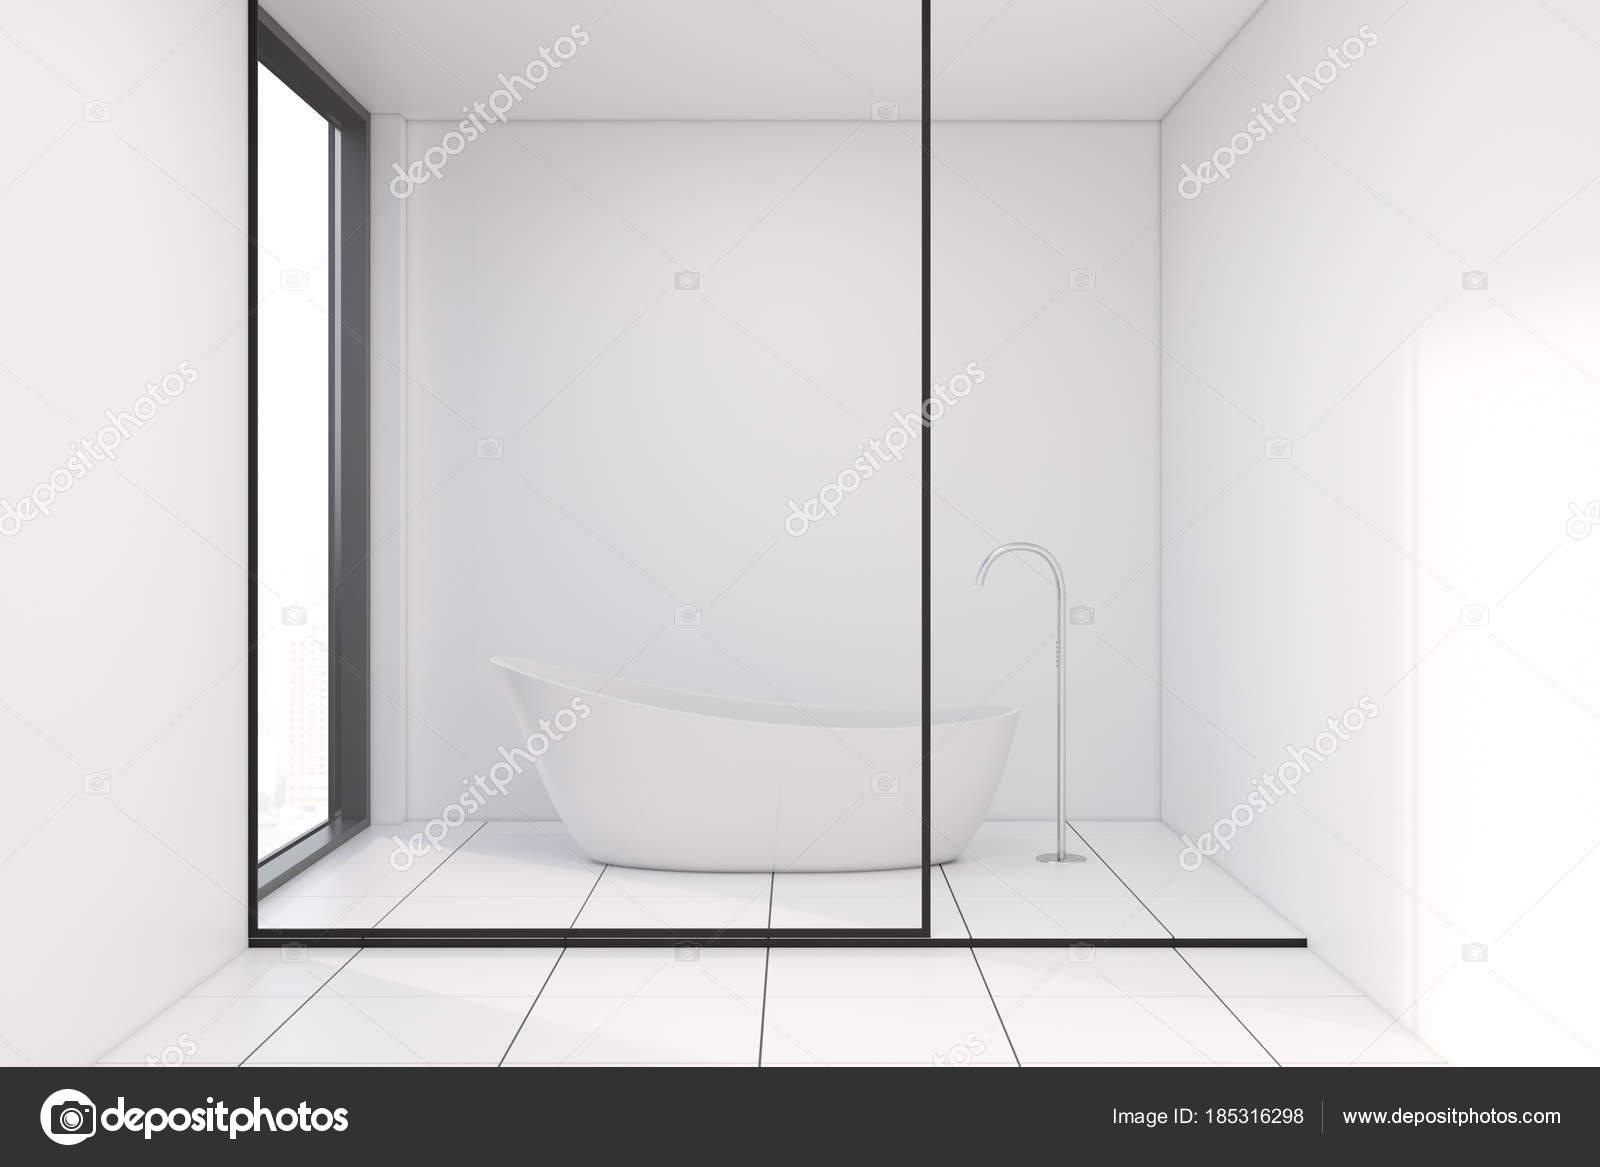 Vasca Da Bagno Vetro : Vetro parete bagno con una vasca bianca u foto stock